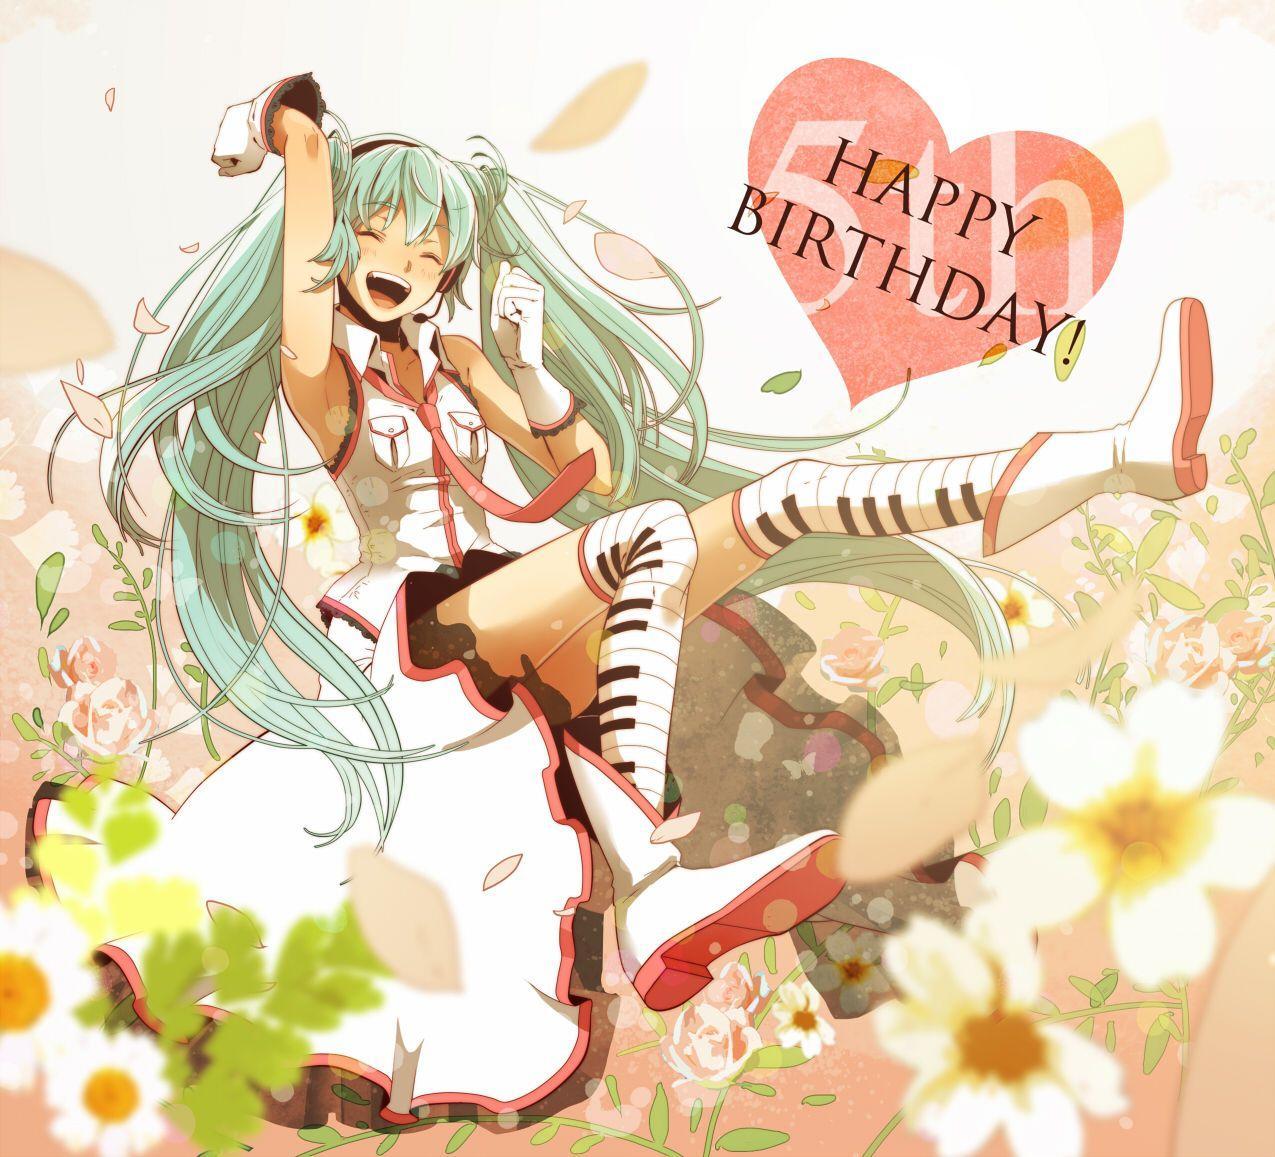 Happy Birthday Anime Wallpapers - Top Free Happy Birthday ...